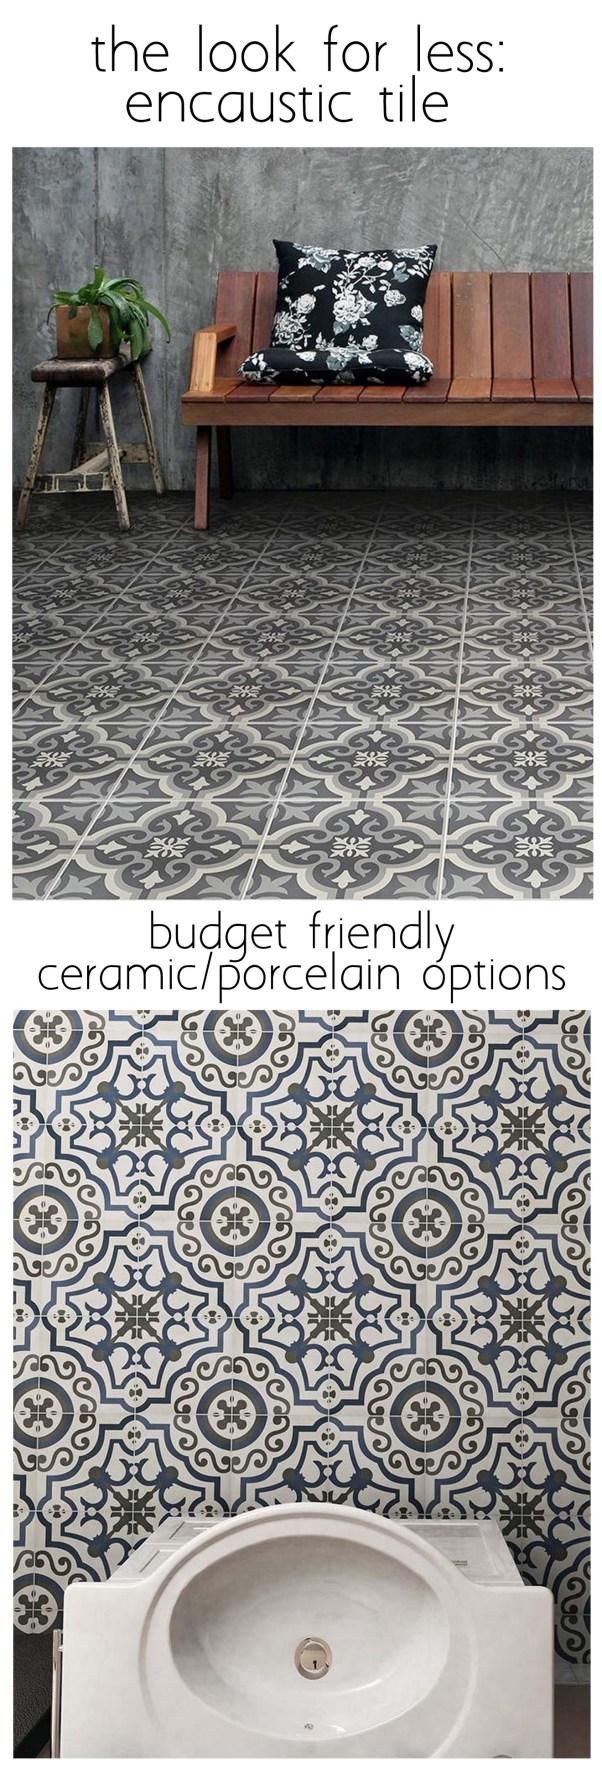 encaustic-tile-look-for-less